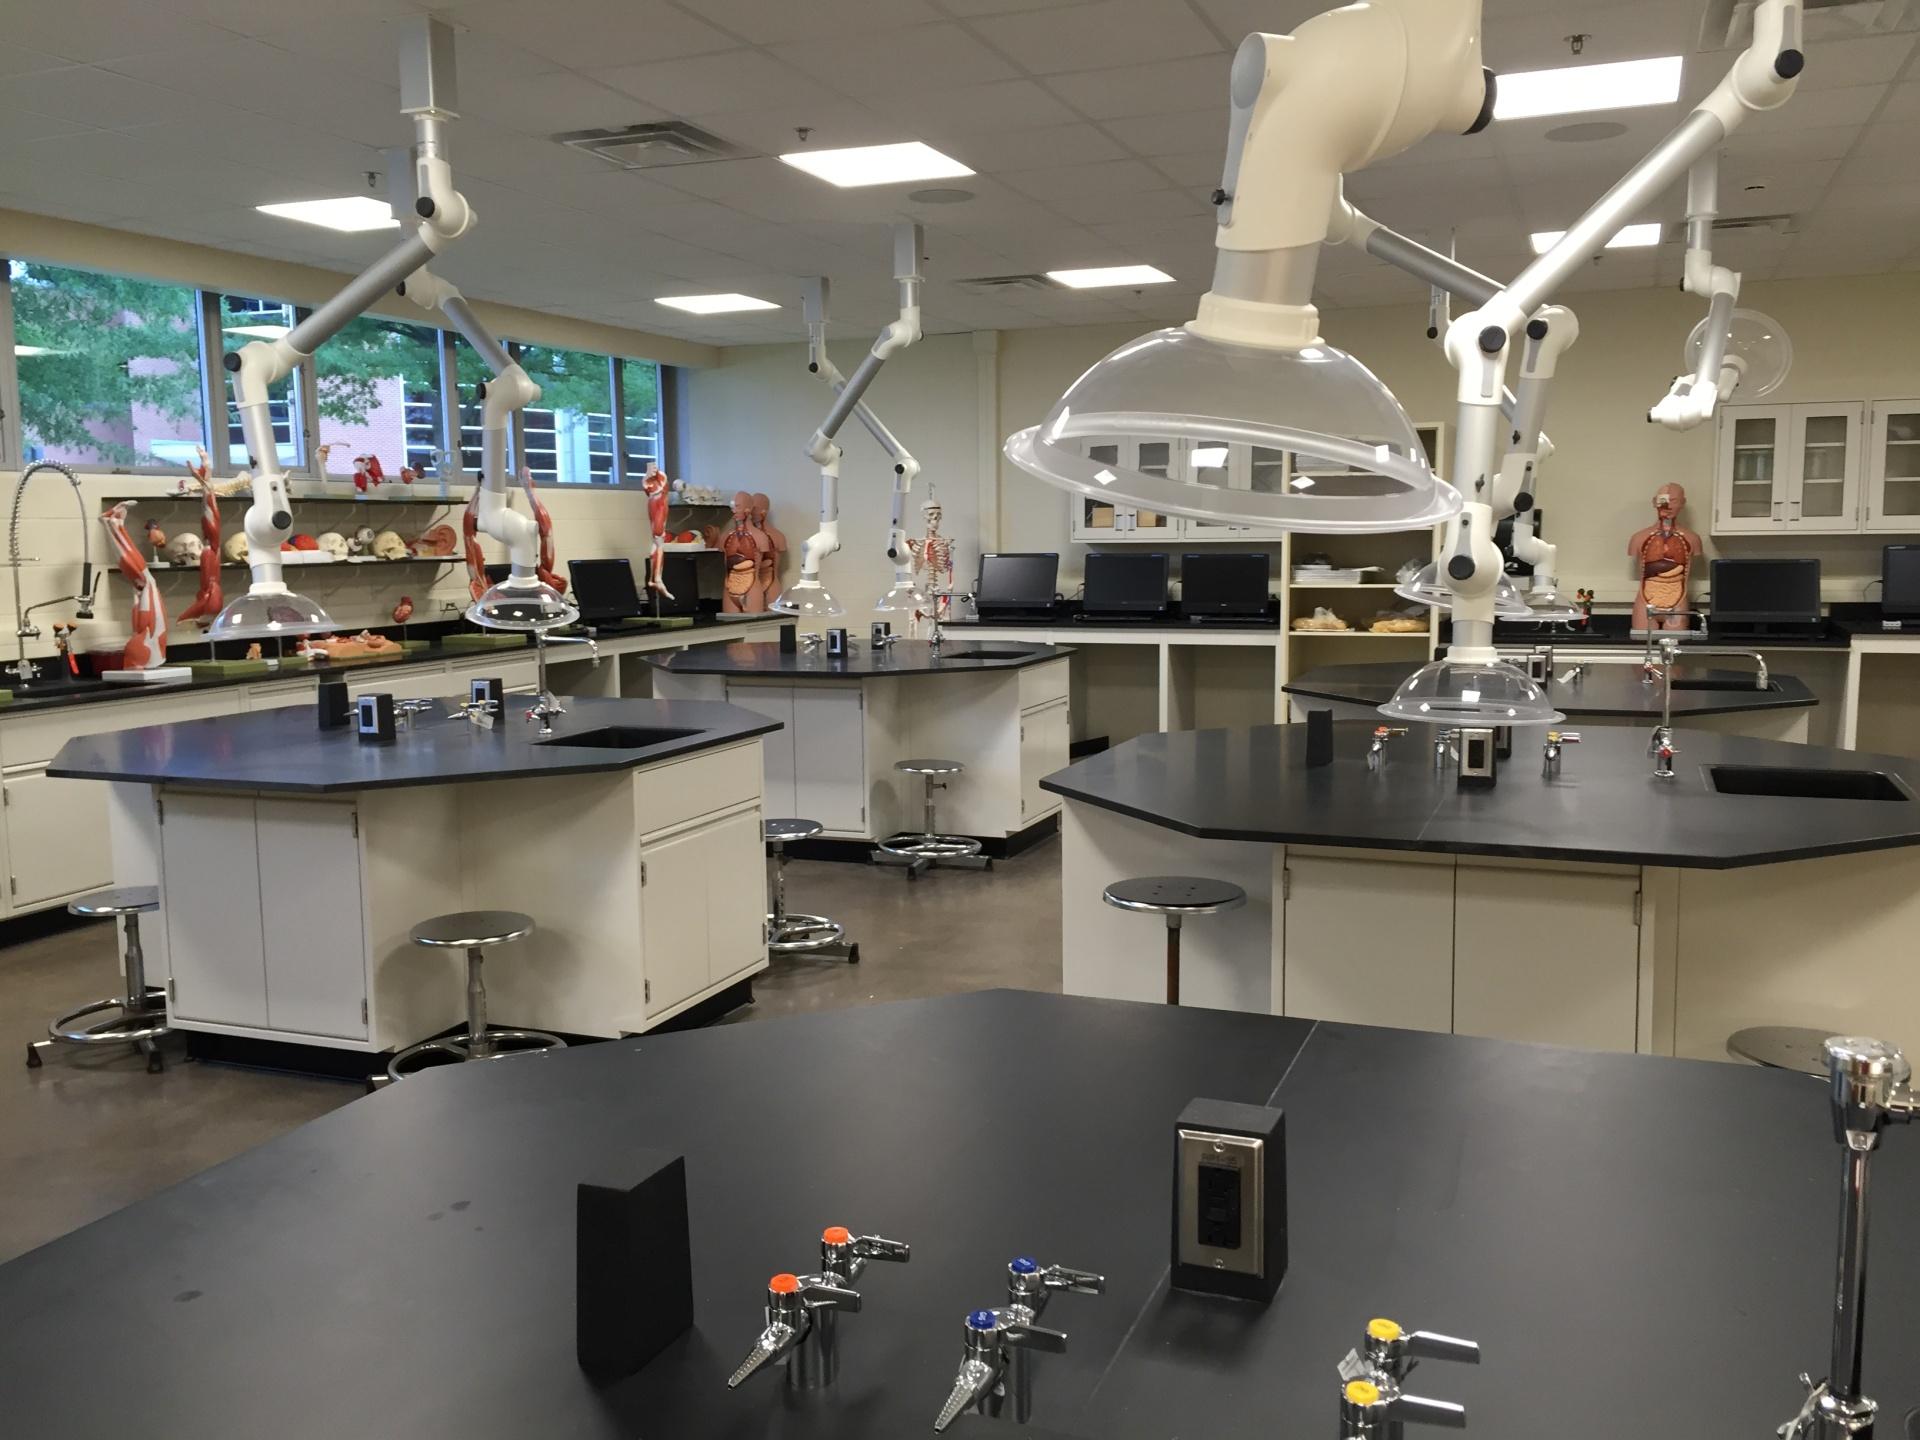 laboratory science technology building lab state harrisburg university psu pennsylvania inc